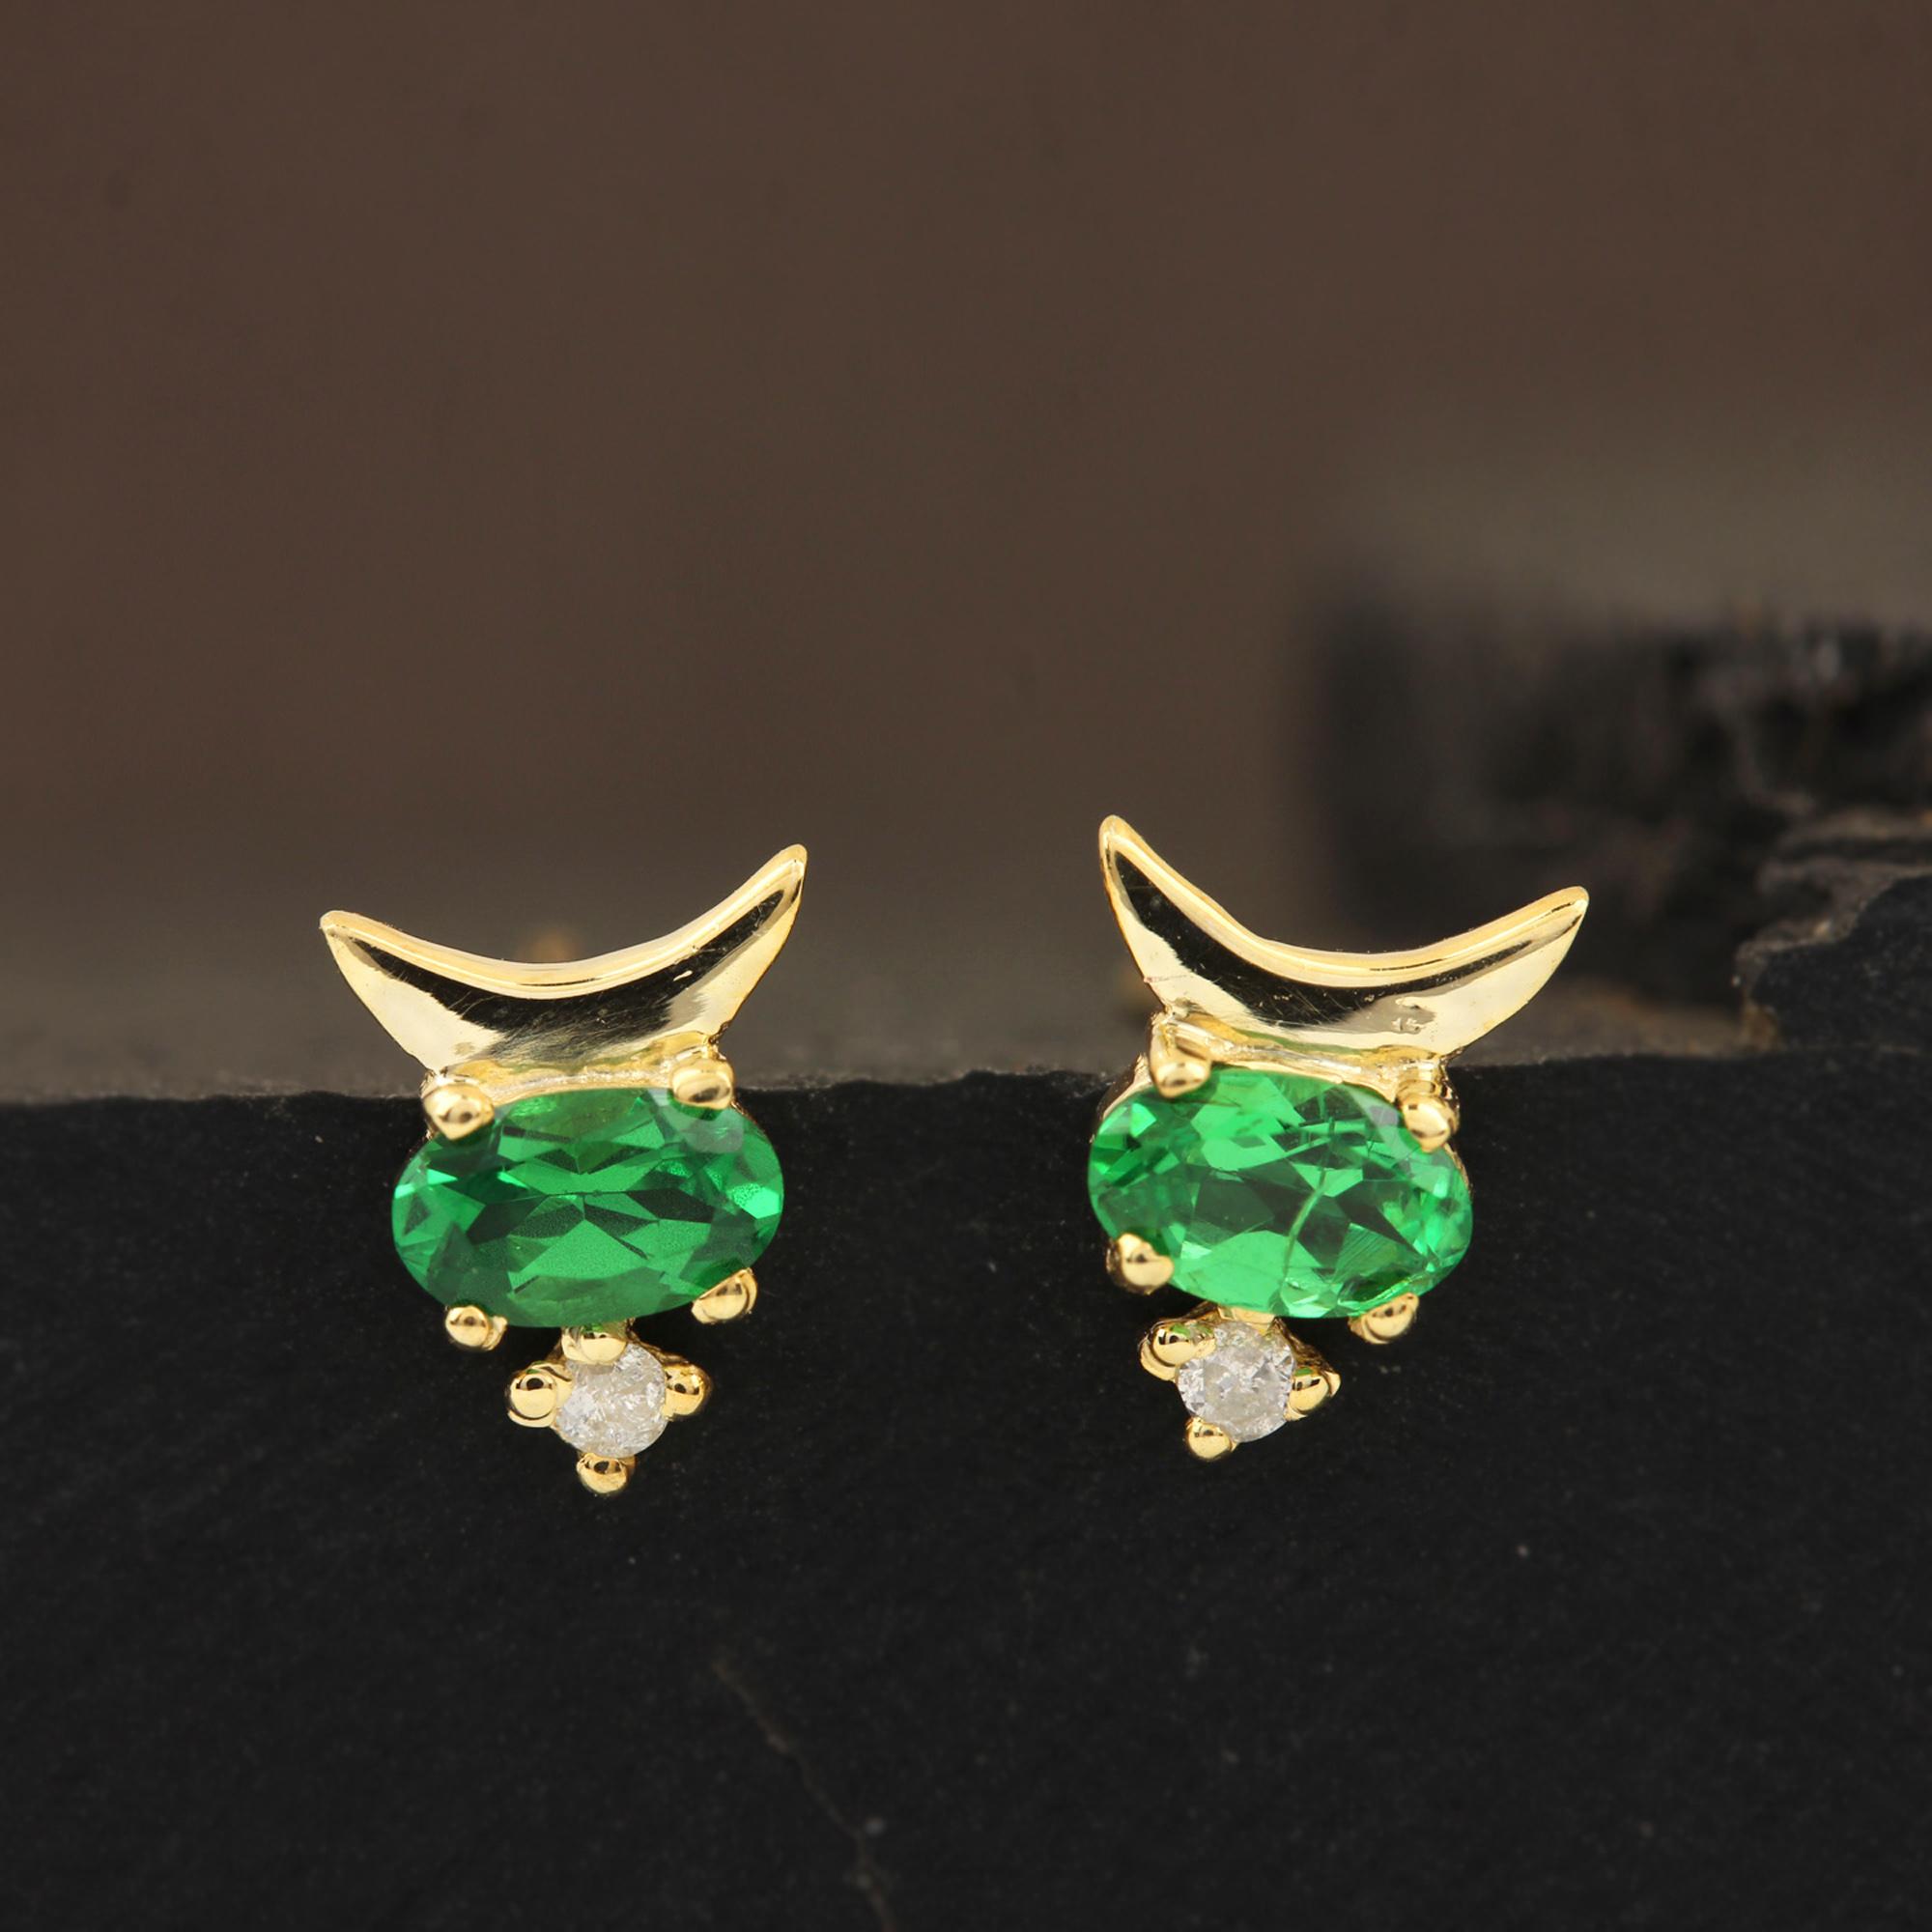 Solid 14k Gold Diamond & Natural Tsavorite Gemstone Stud Earrings